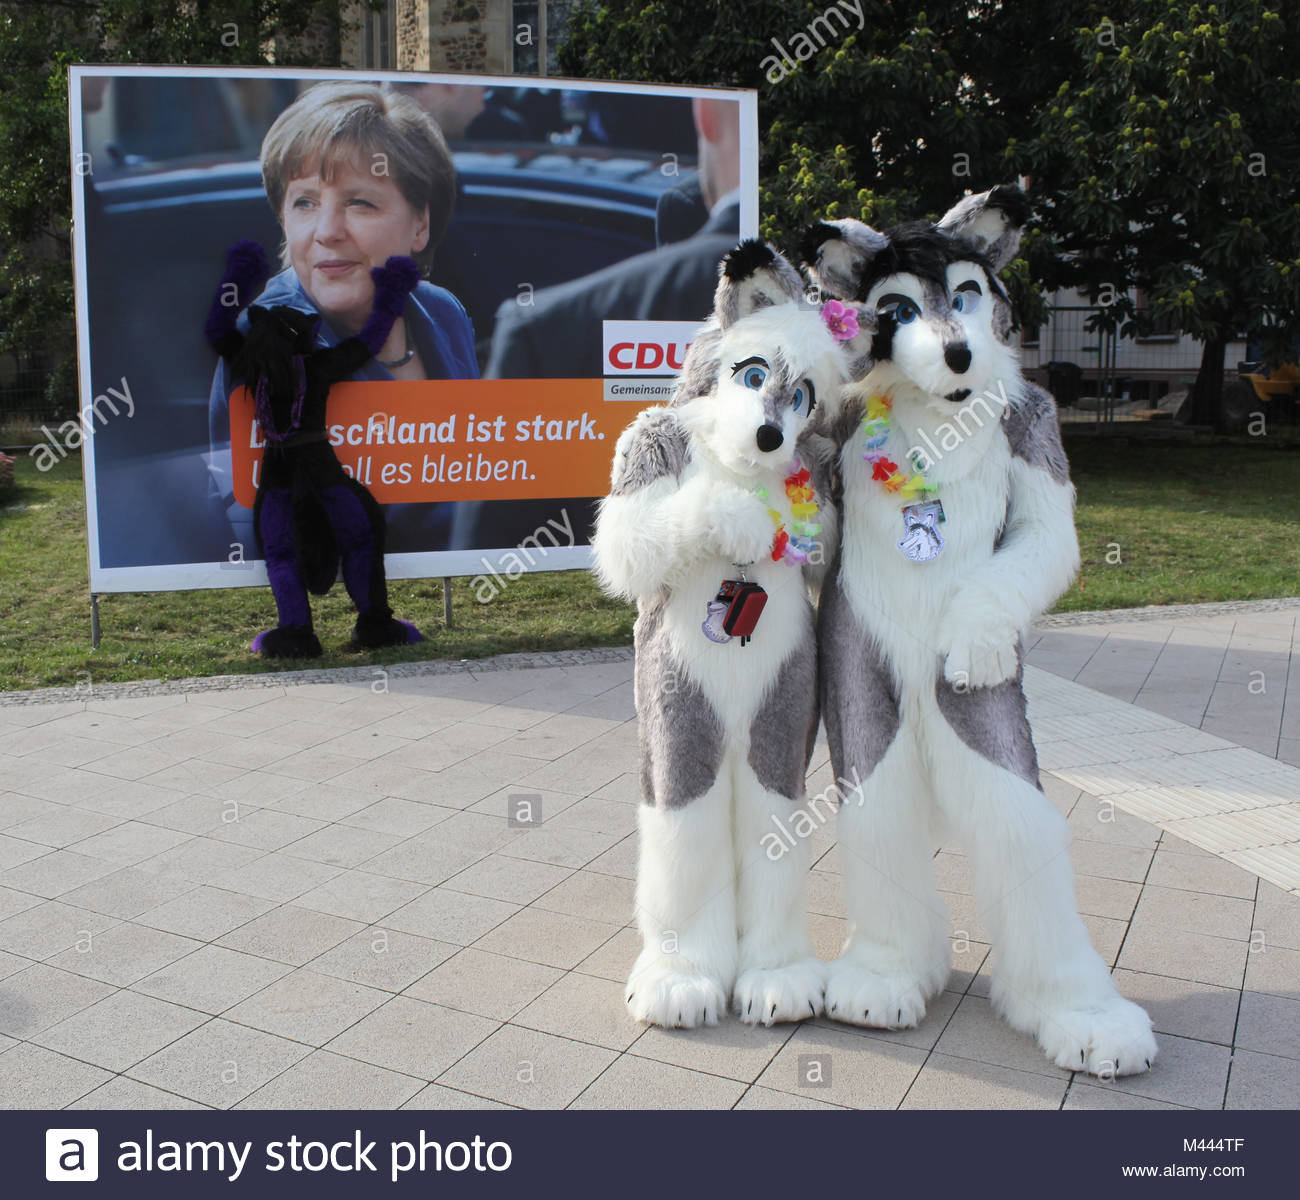 tierische Anblicke am Rande der Eurofurencce Convention in Magdeburg - Stock Image